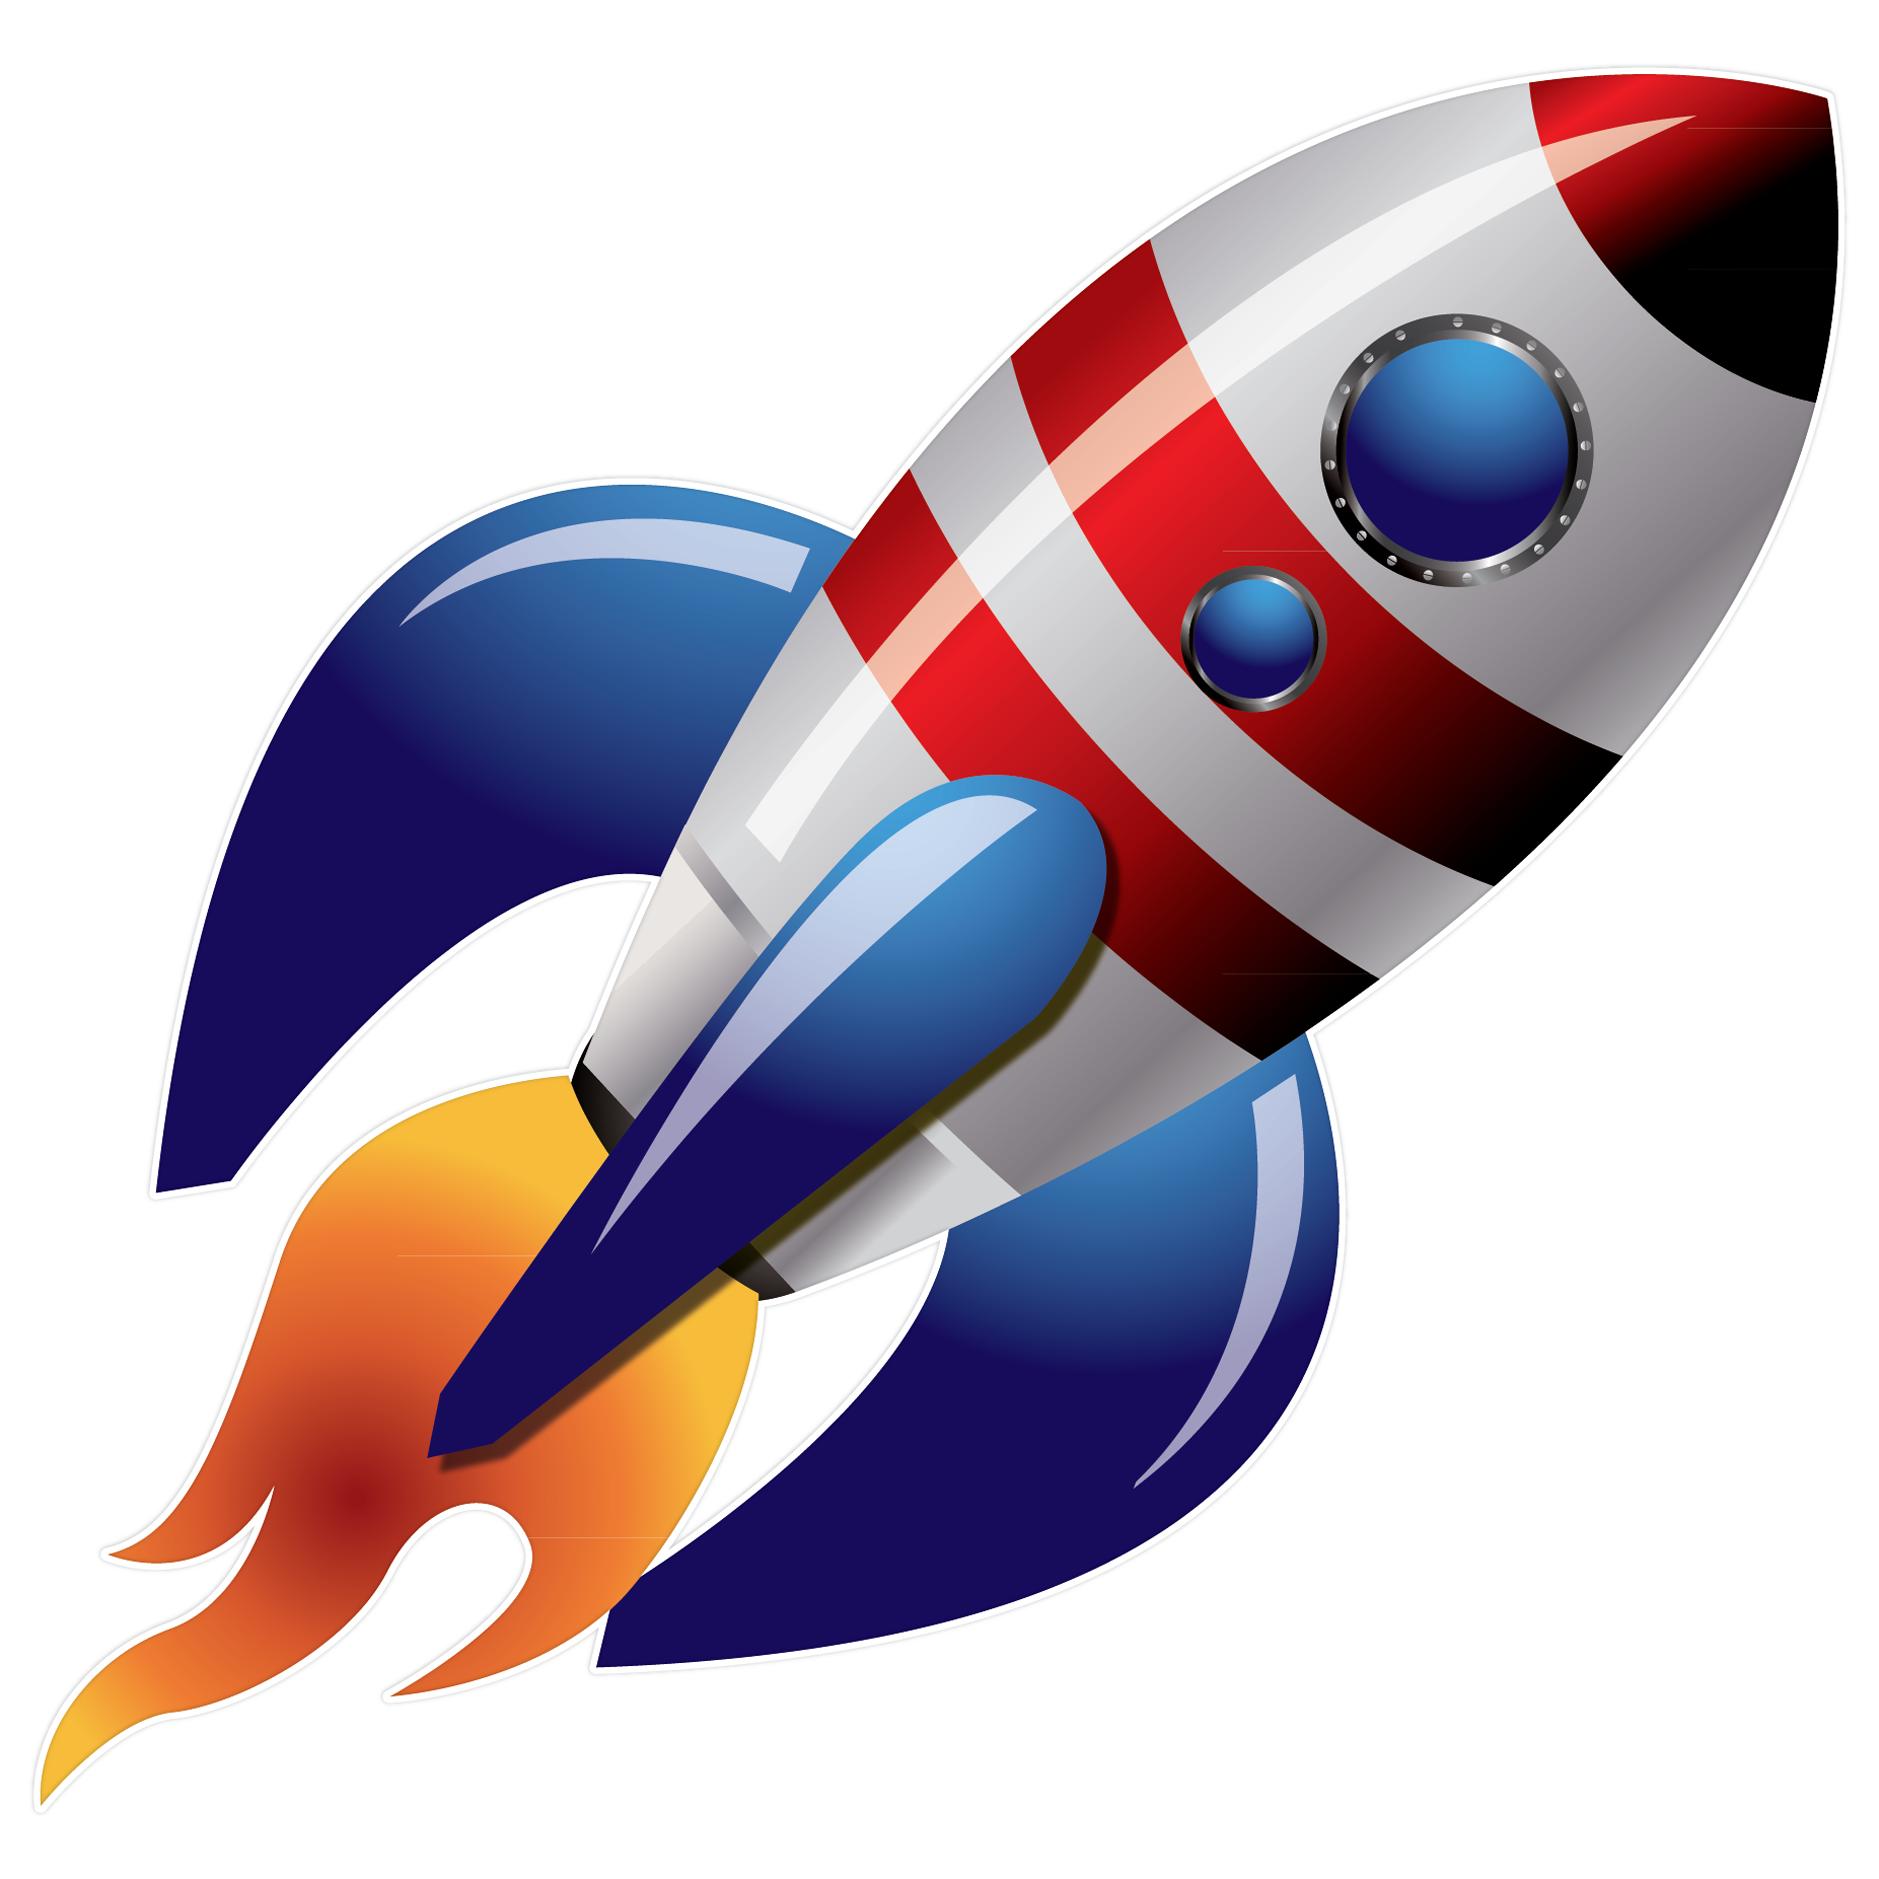 space rocket emoji pearltrees rocket clipart for kids free rocket clip art printable